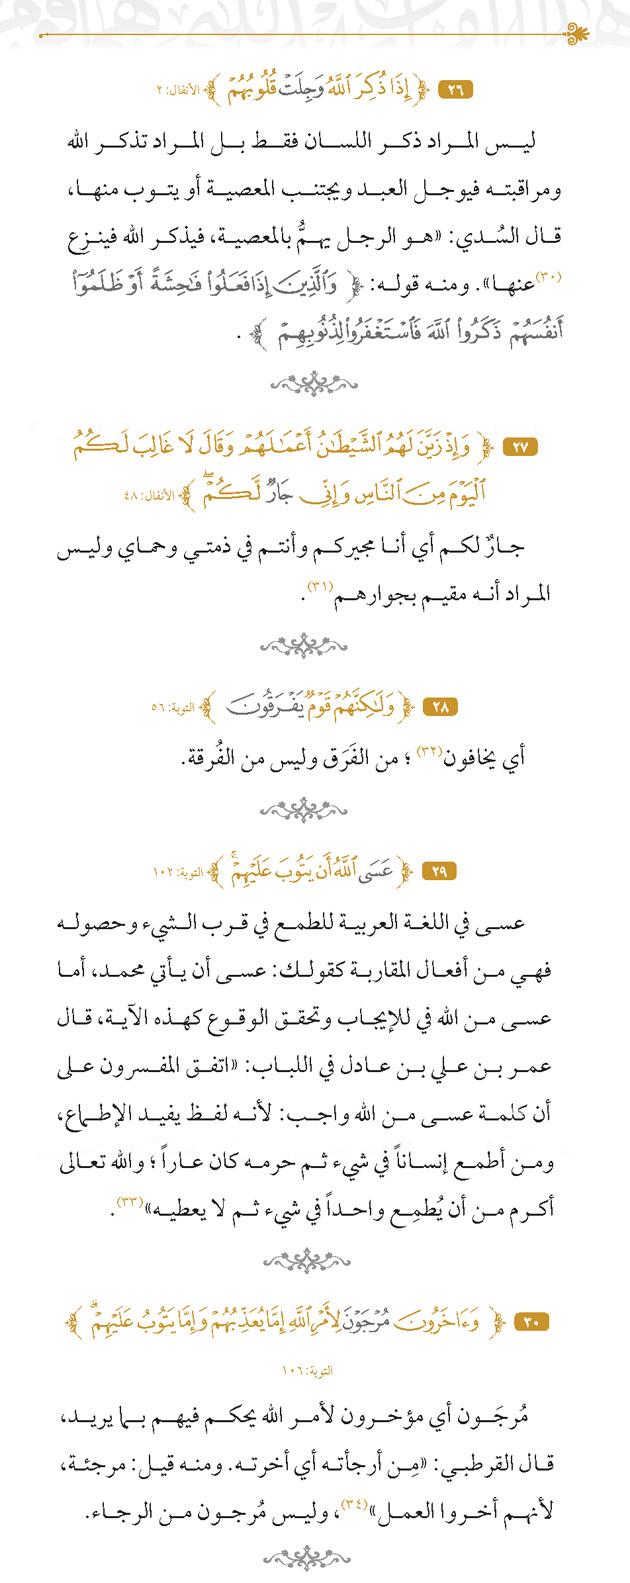 akhawat_islamway_1393015917__26-30.jpg